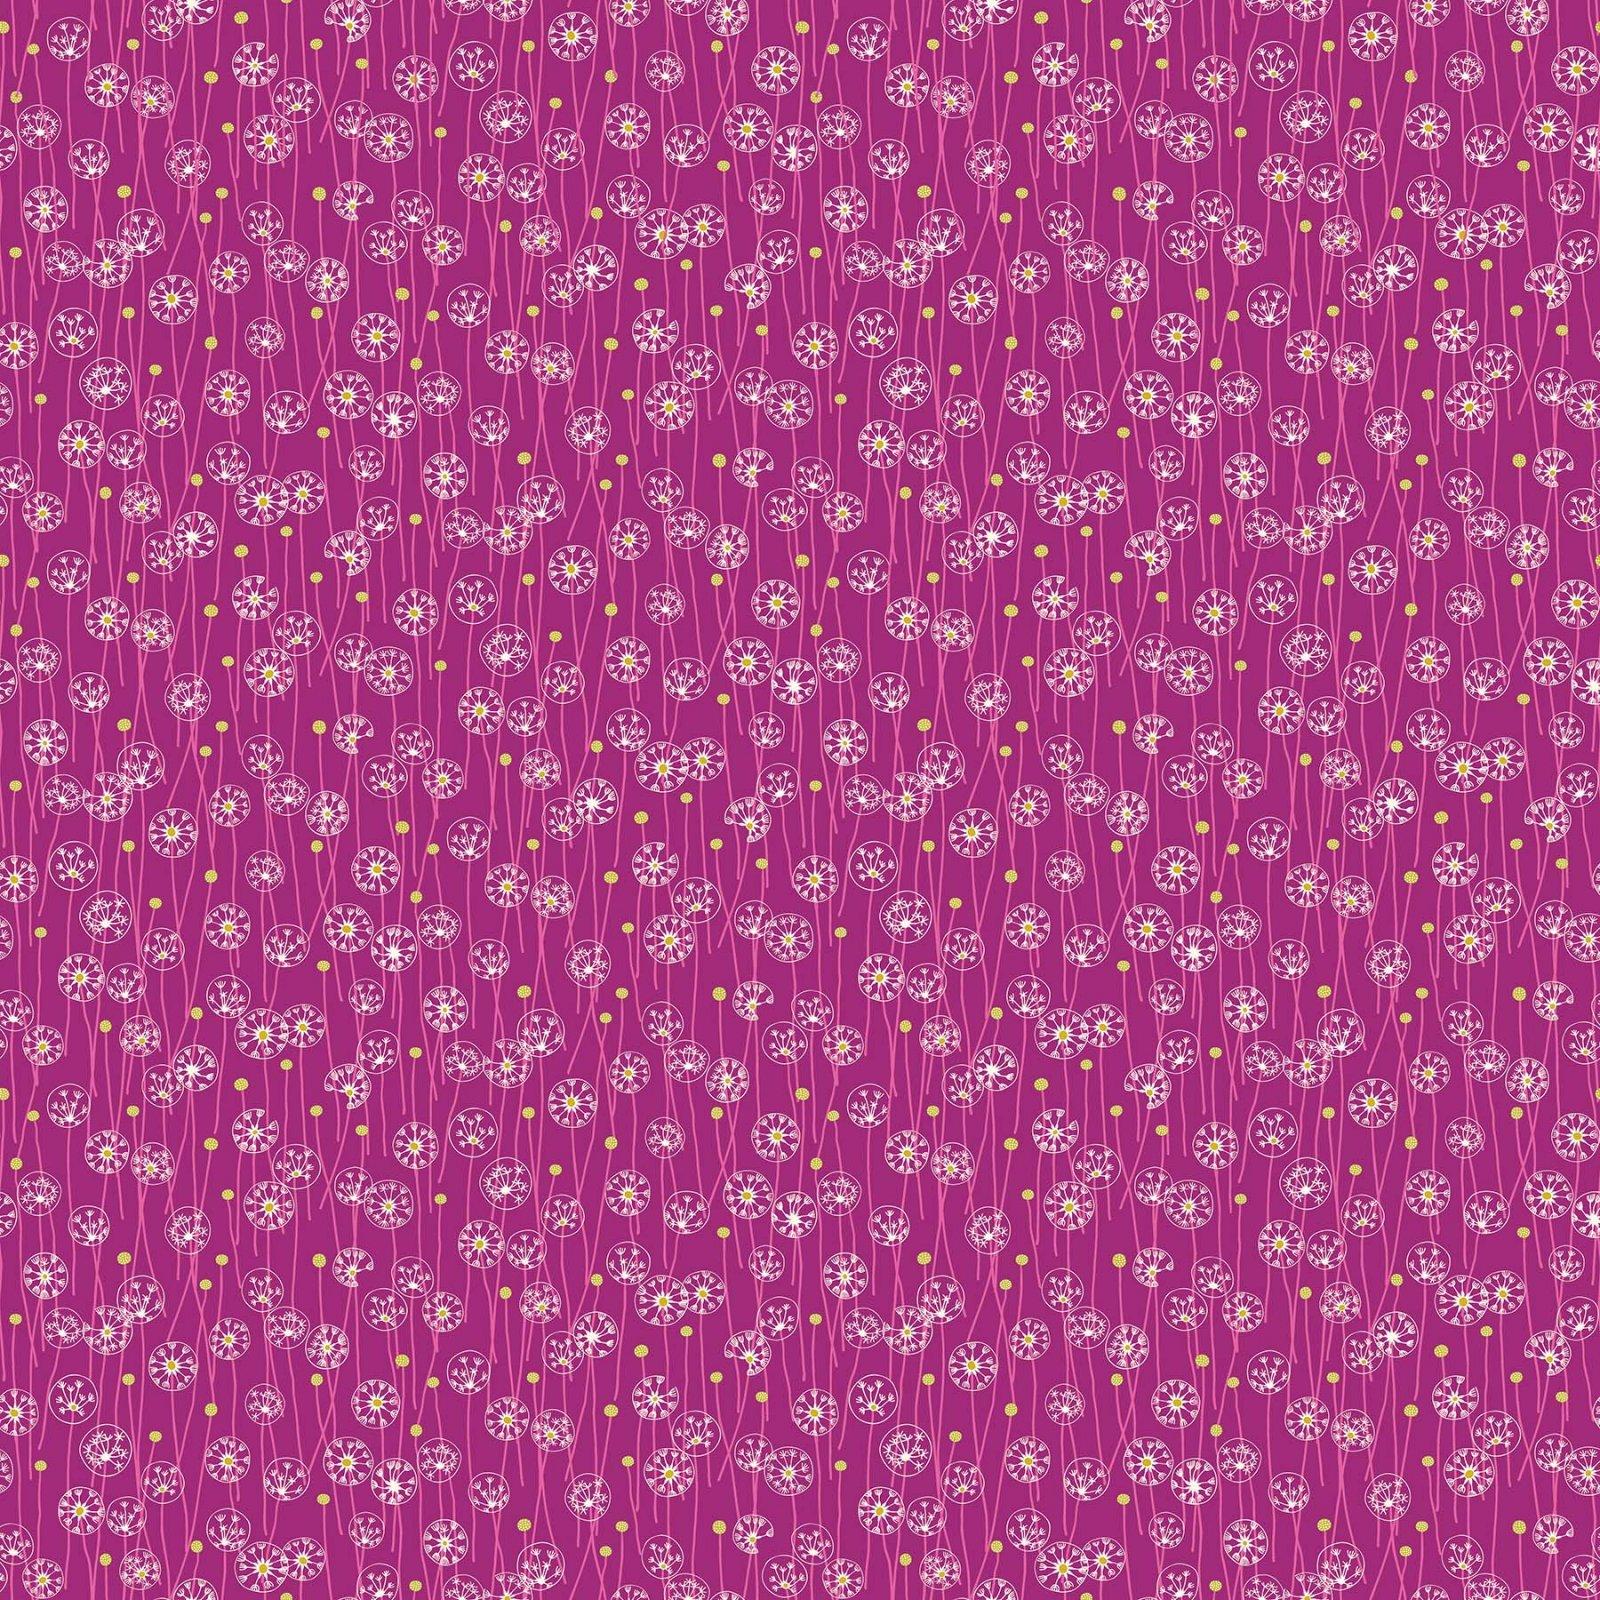 90001/83 Purple: Mountain Meadow (Pippa Shaw)